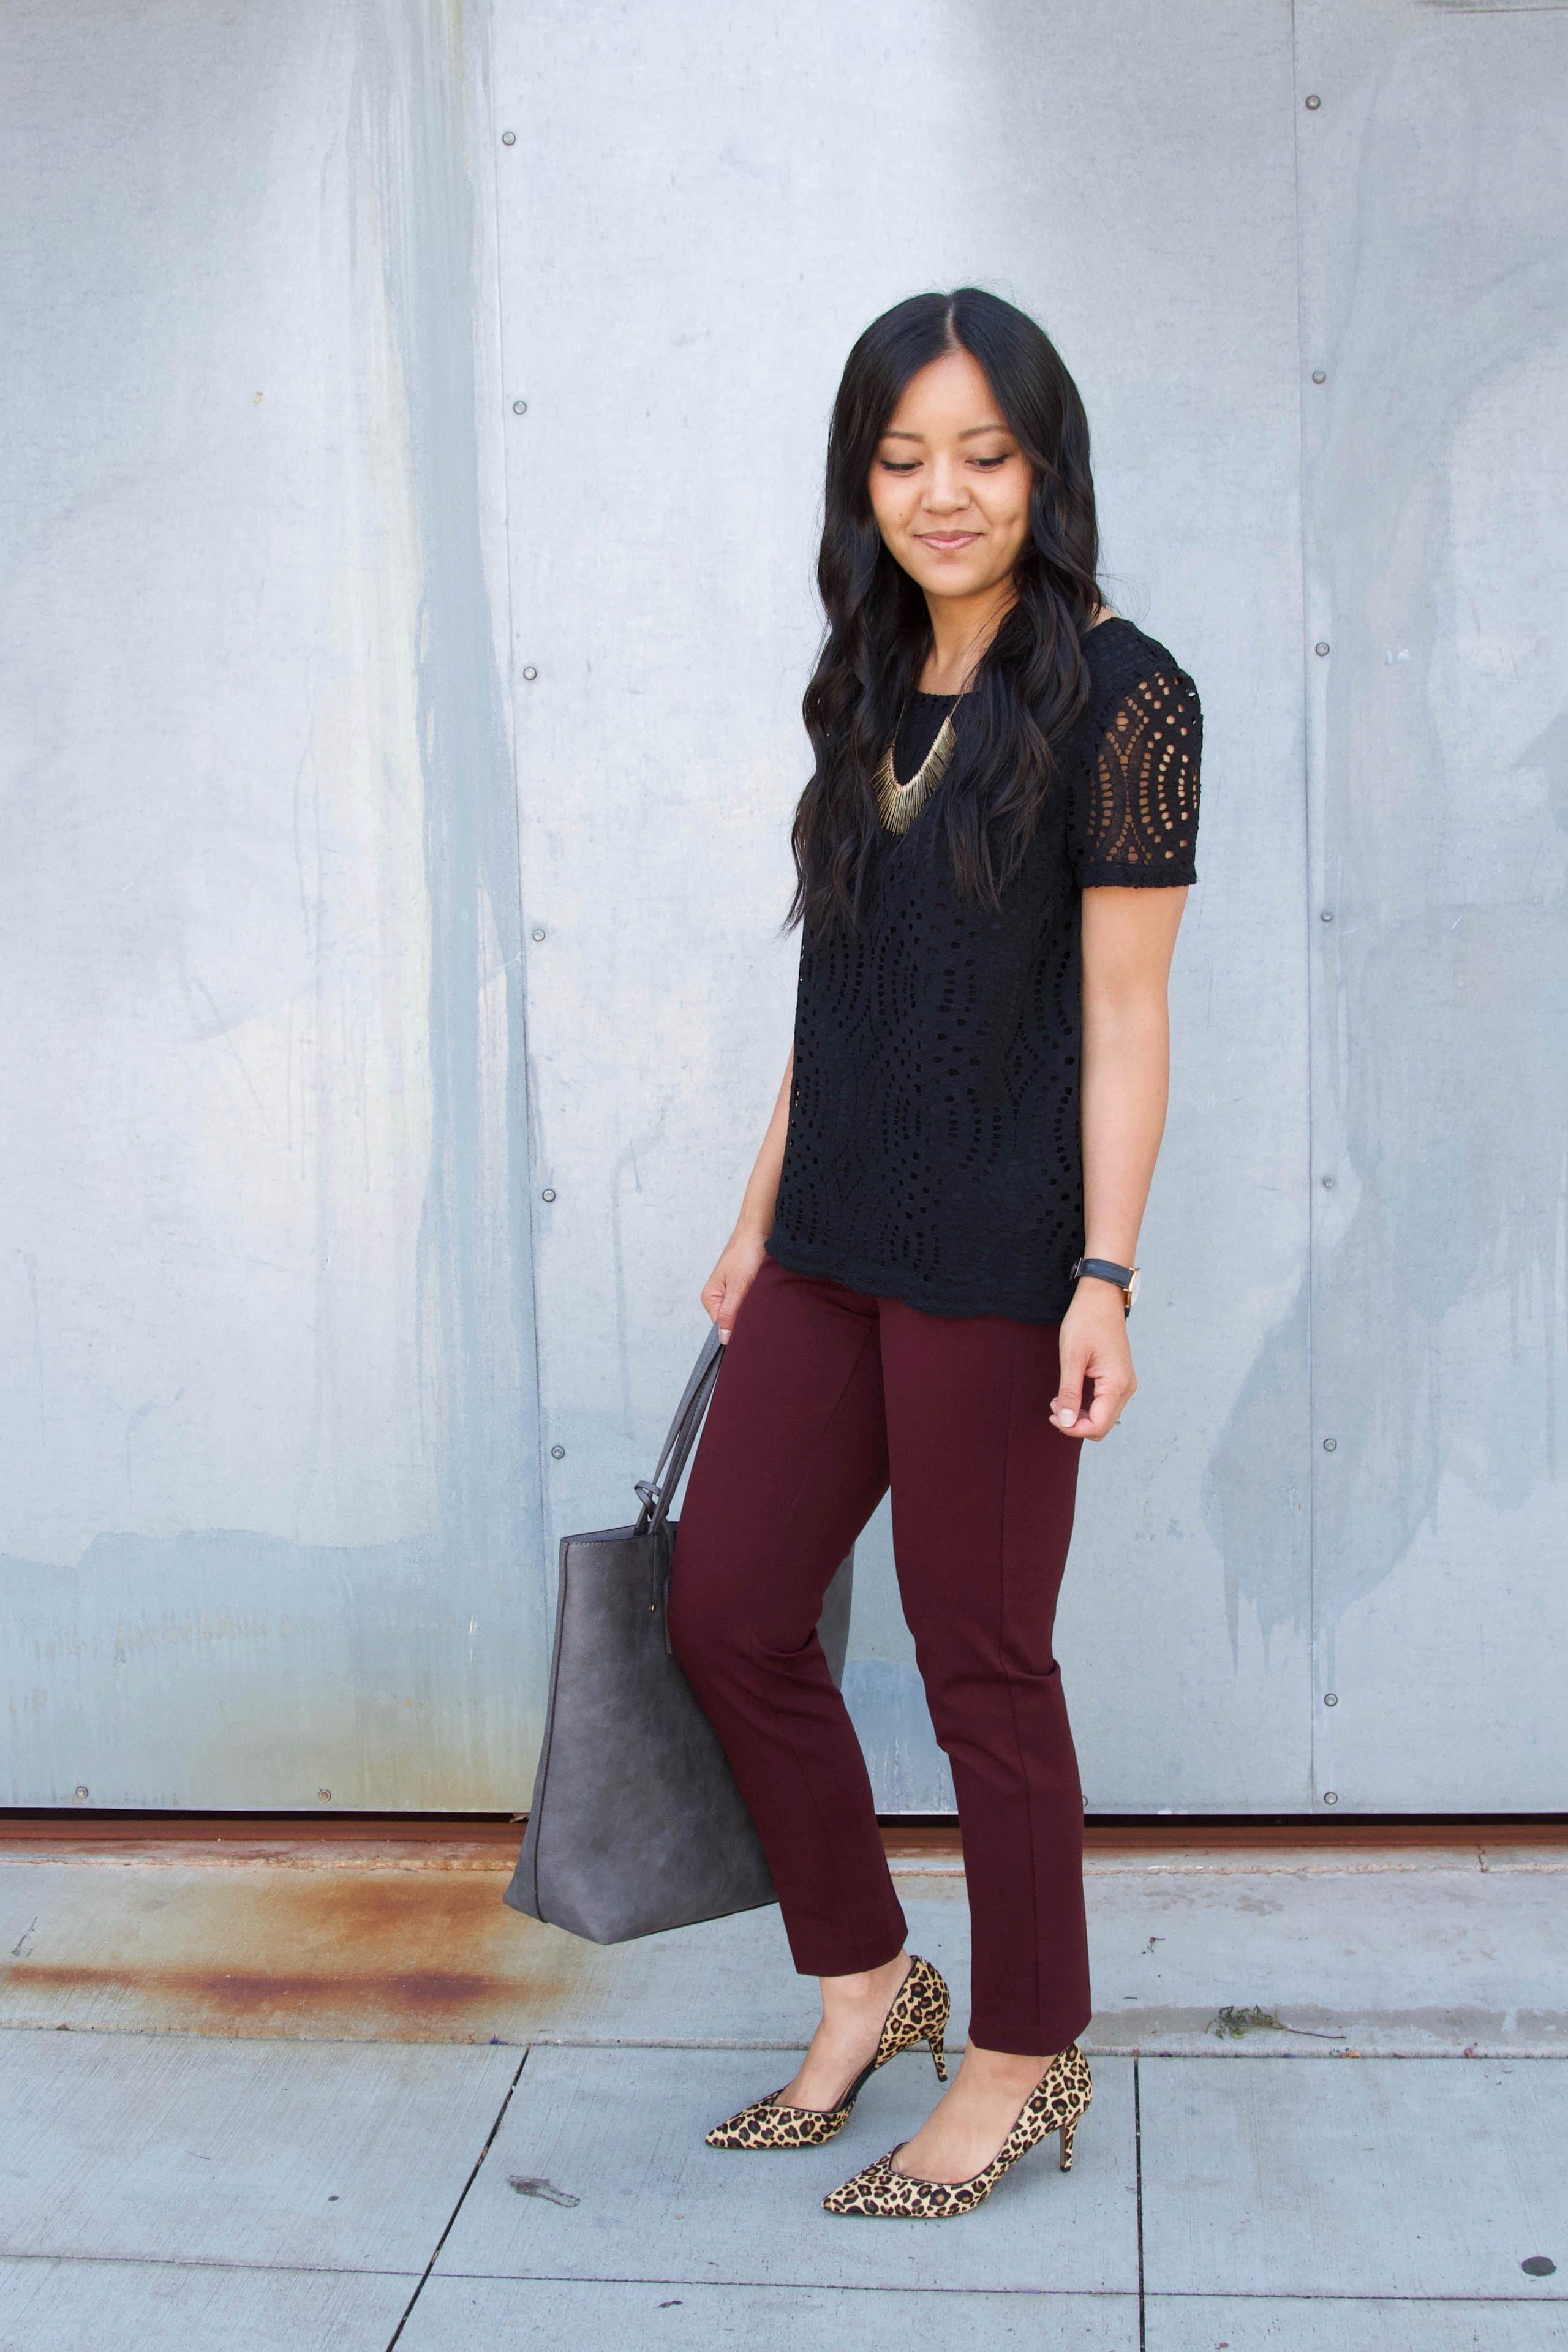 maroon pants + black lace top + leopard print heels + grey tote + statement necklace